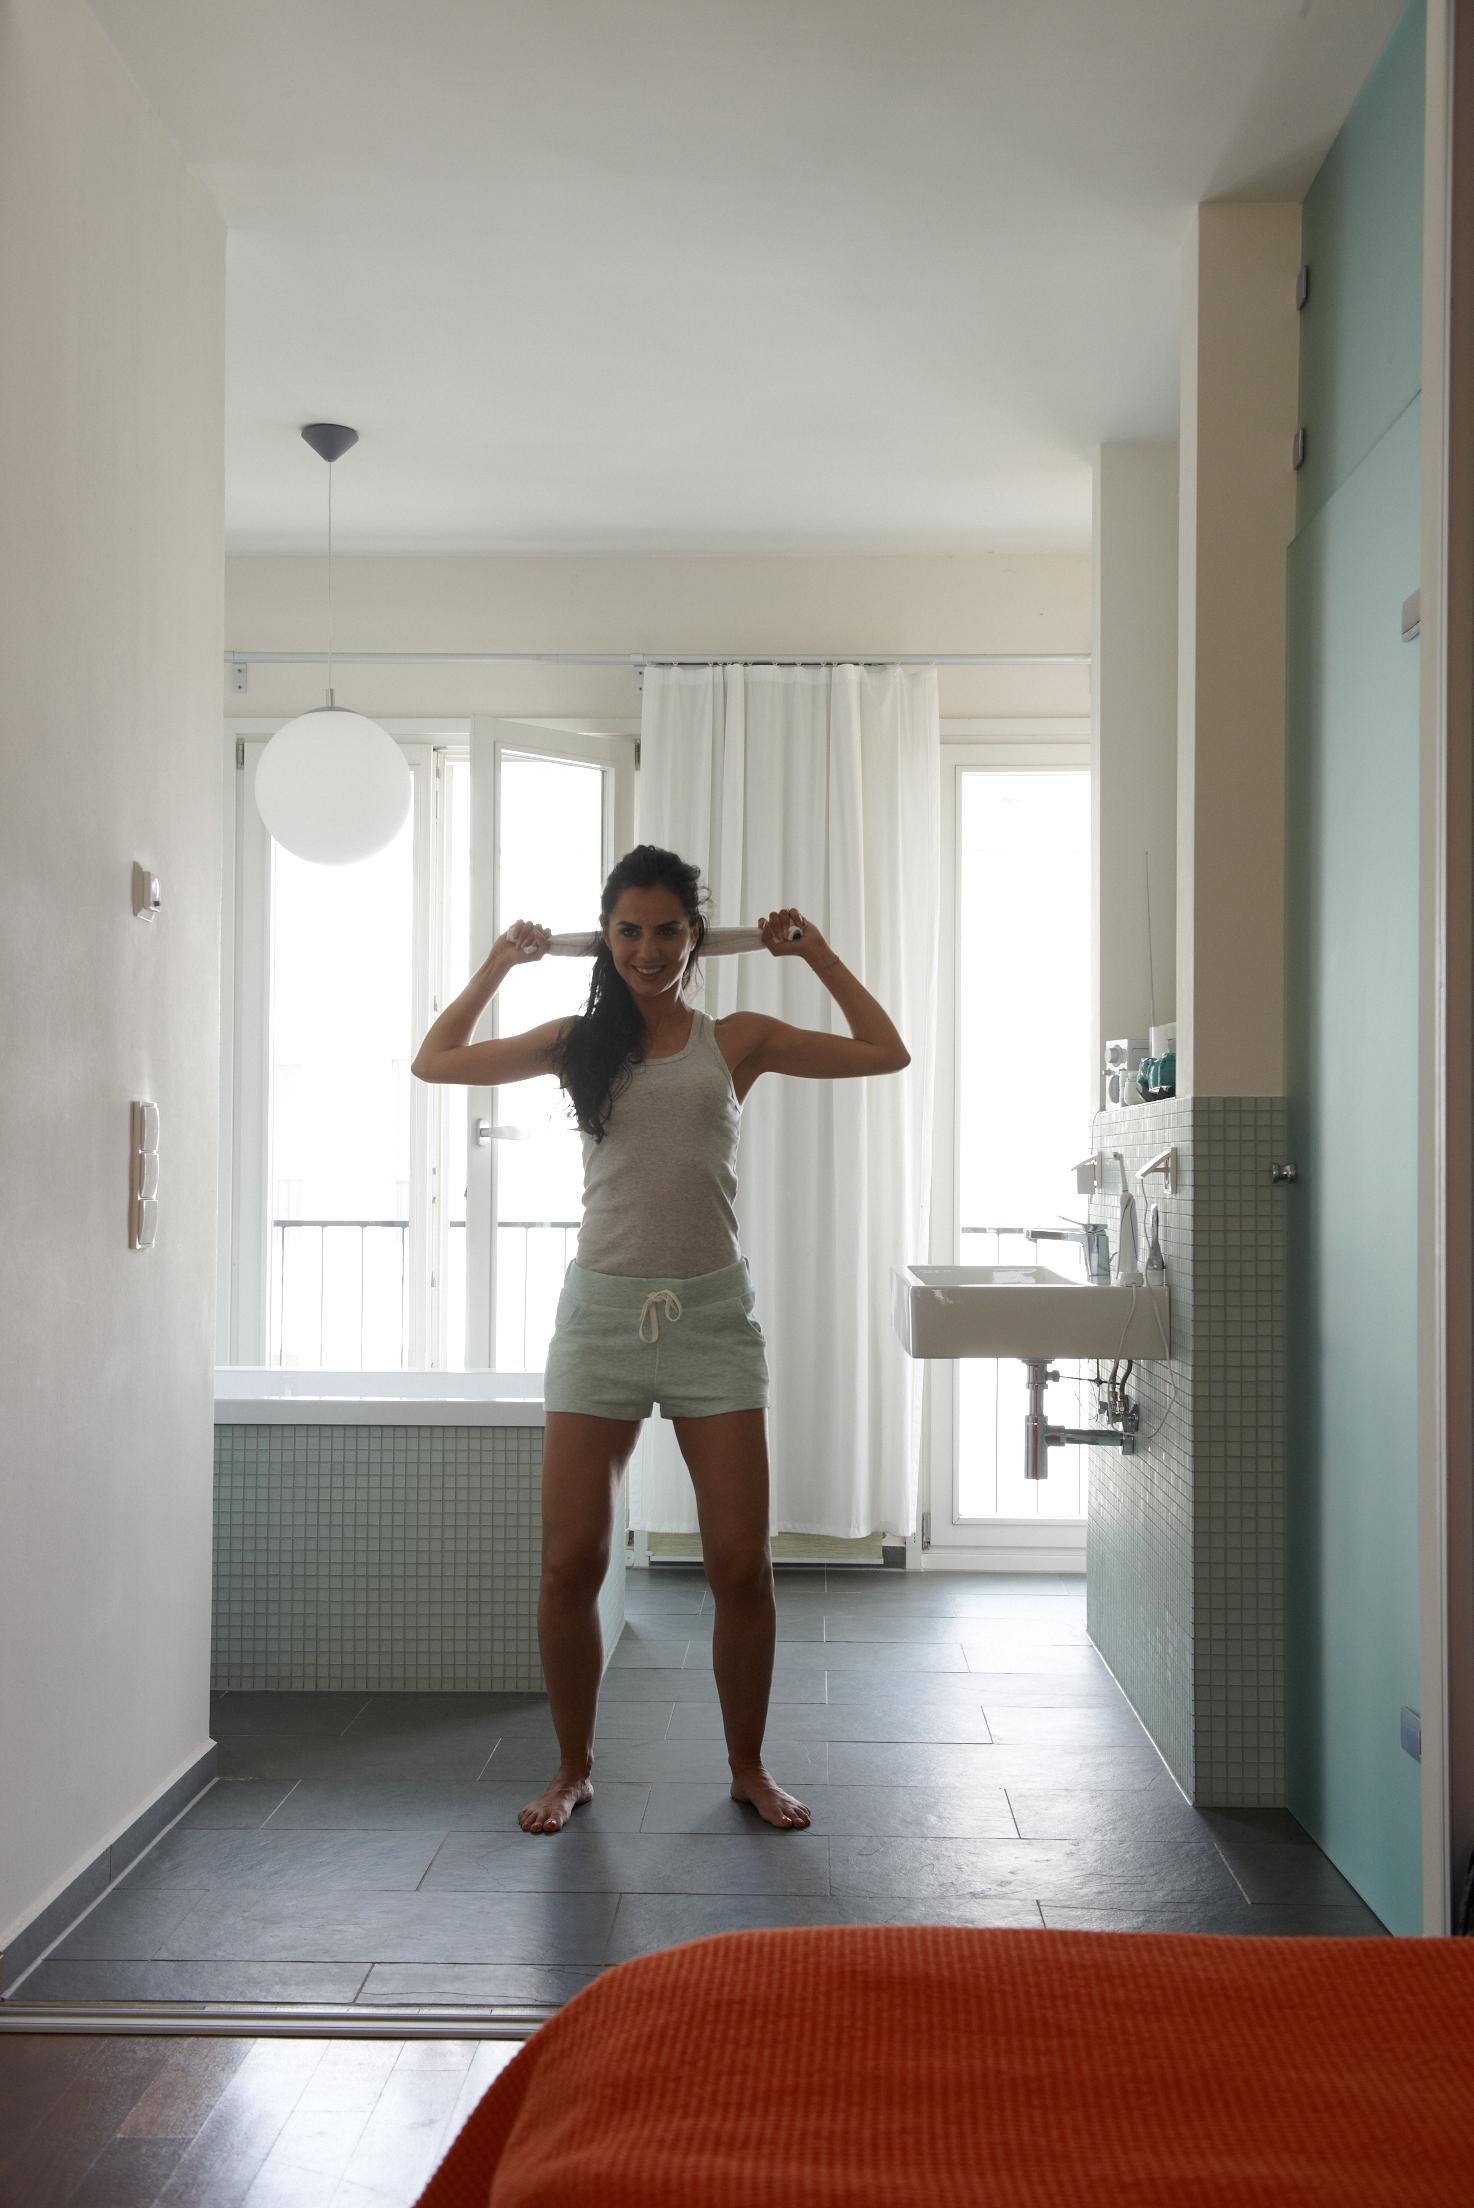 Fitnessschnittchen, Berlin, 06.06.2015_1982.jpg